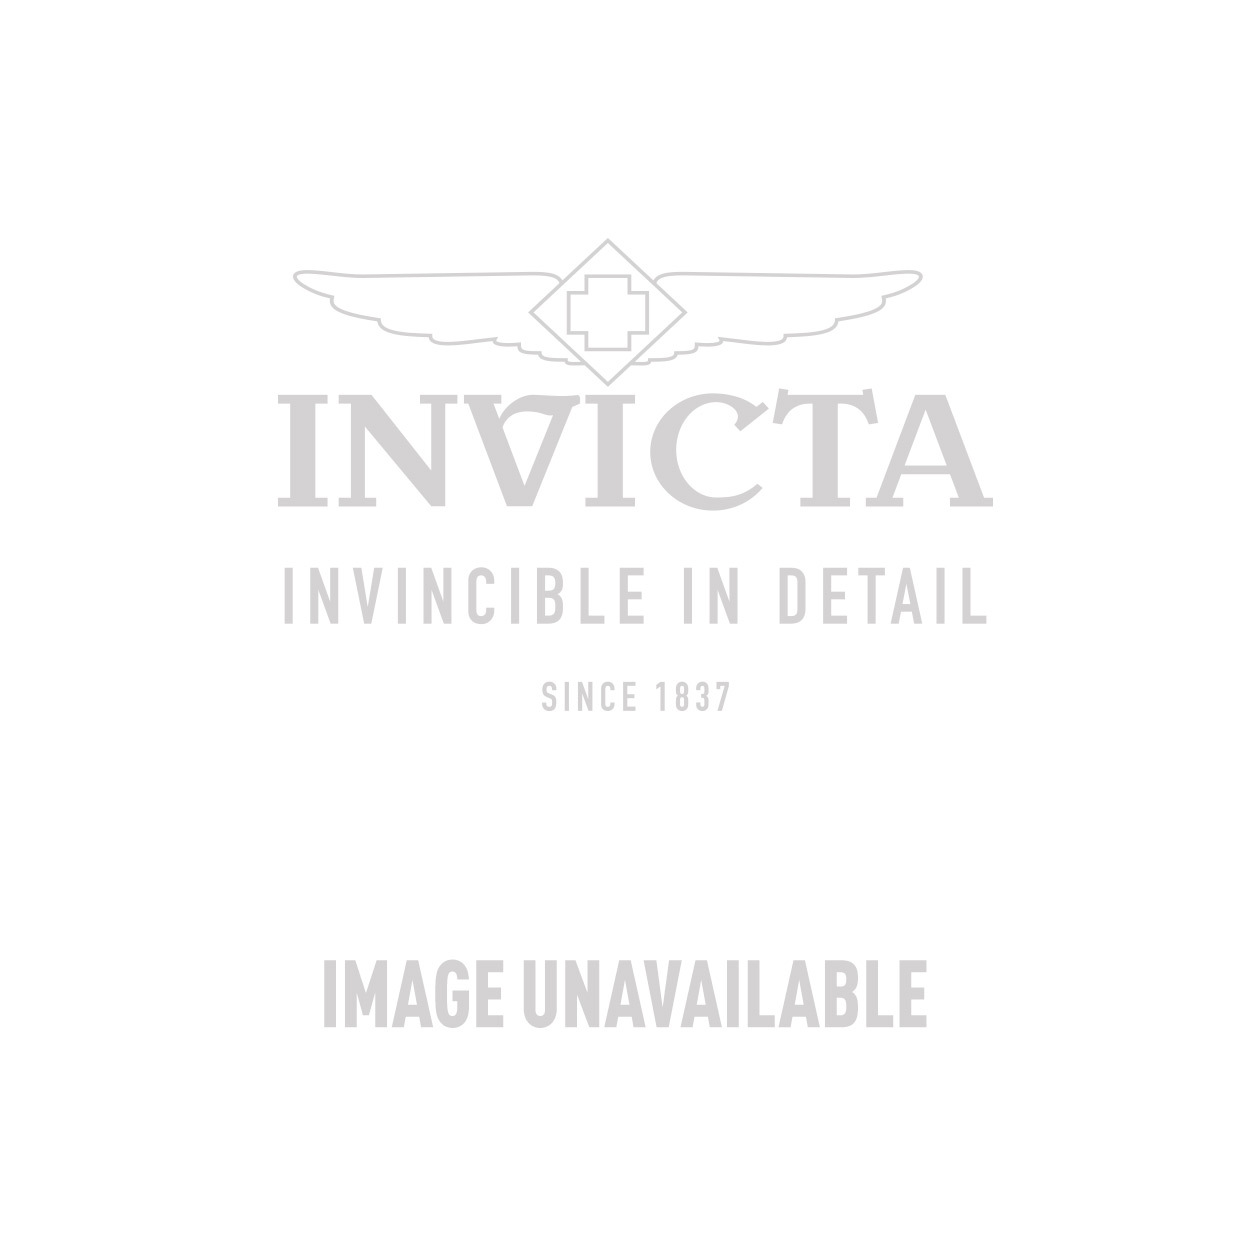 Invicta Bolt Womens Quartz 36 mm Stainless Steel Case White Dial - Model 28923